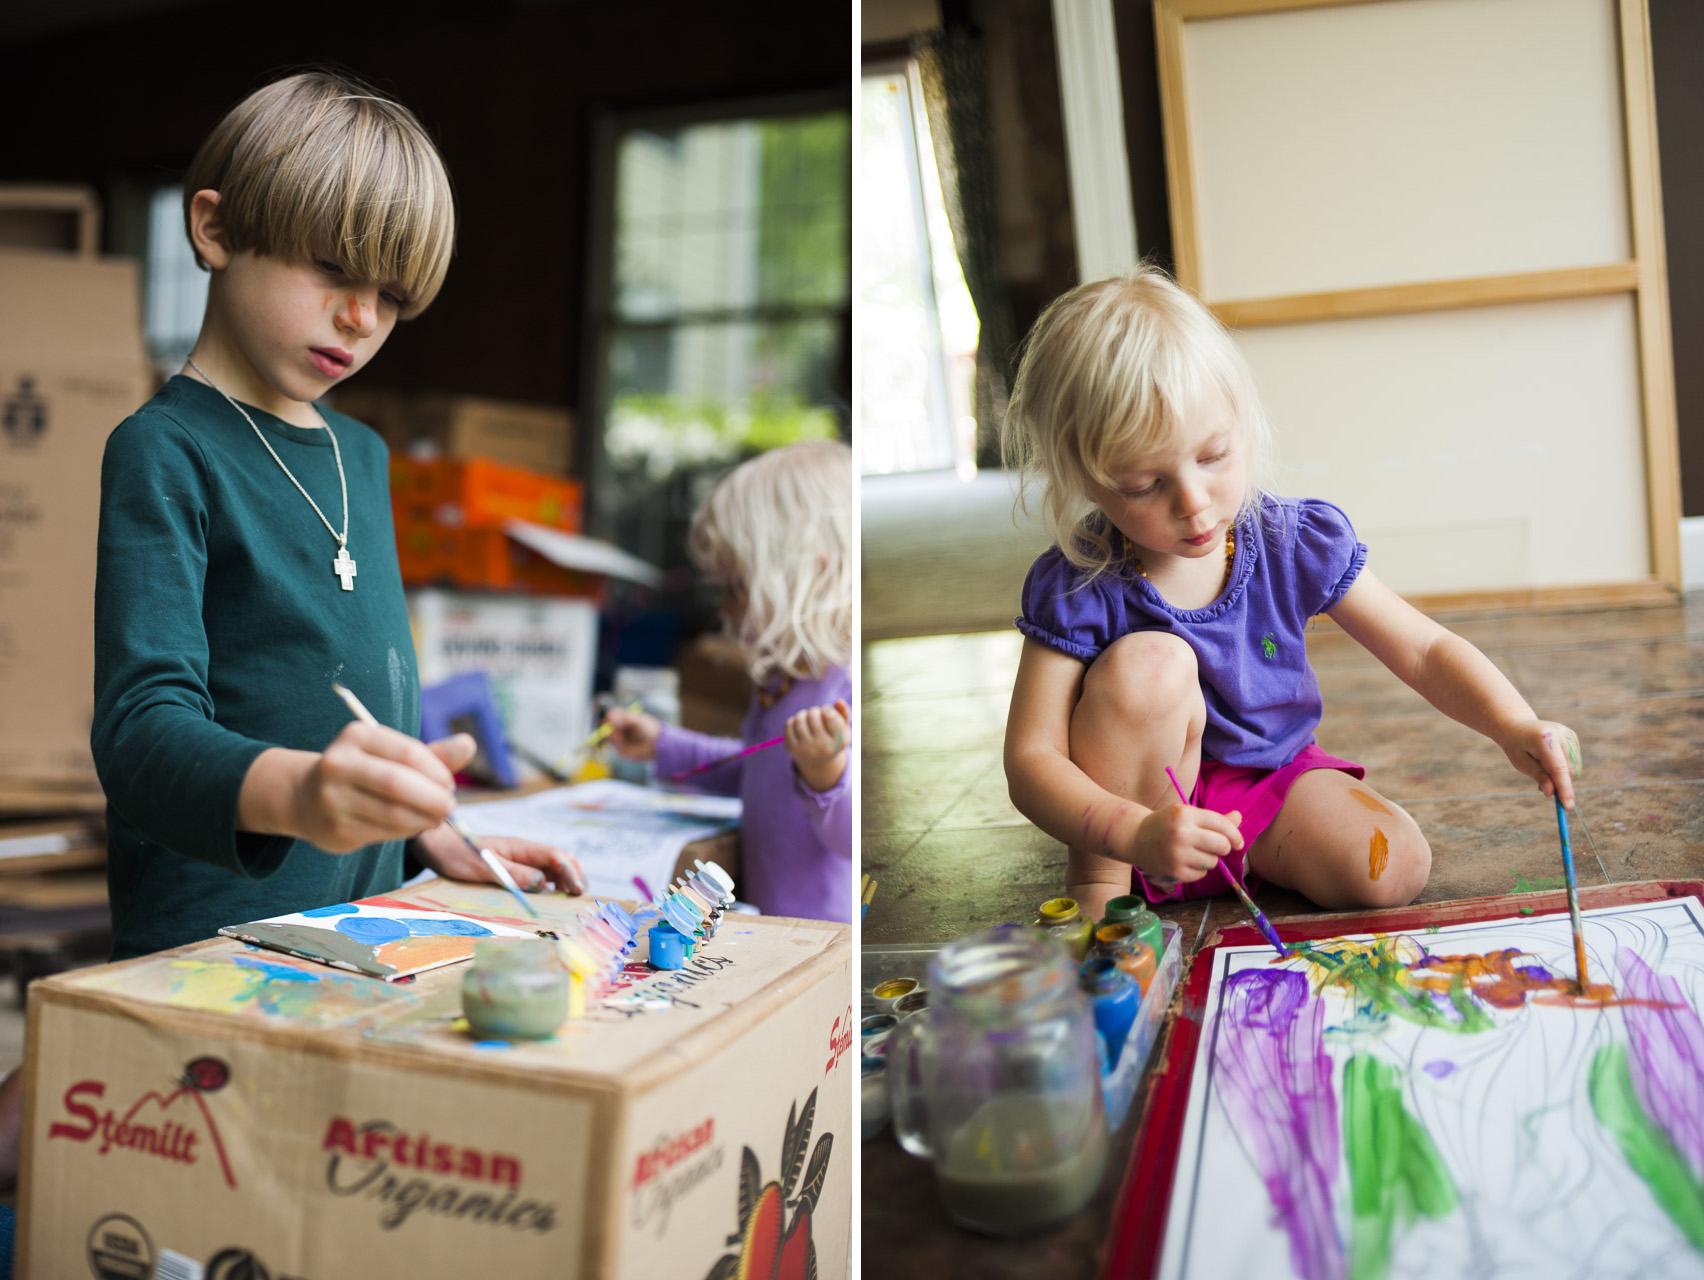 children painting freely // (c) jocelynmathewes.com